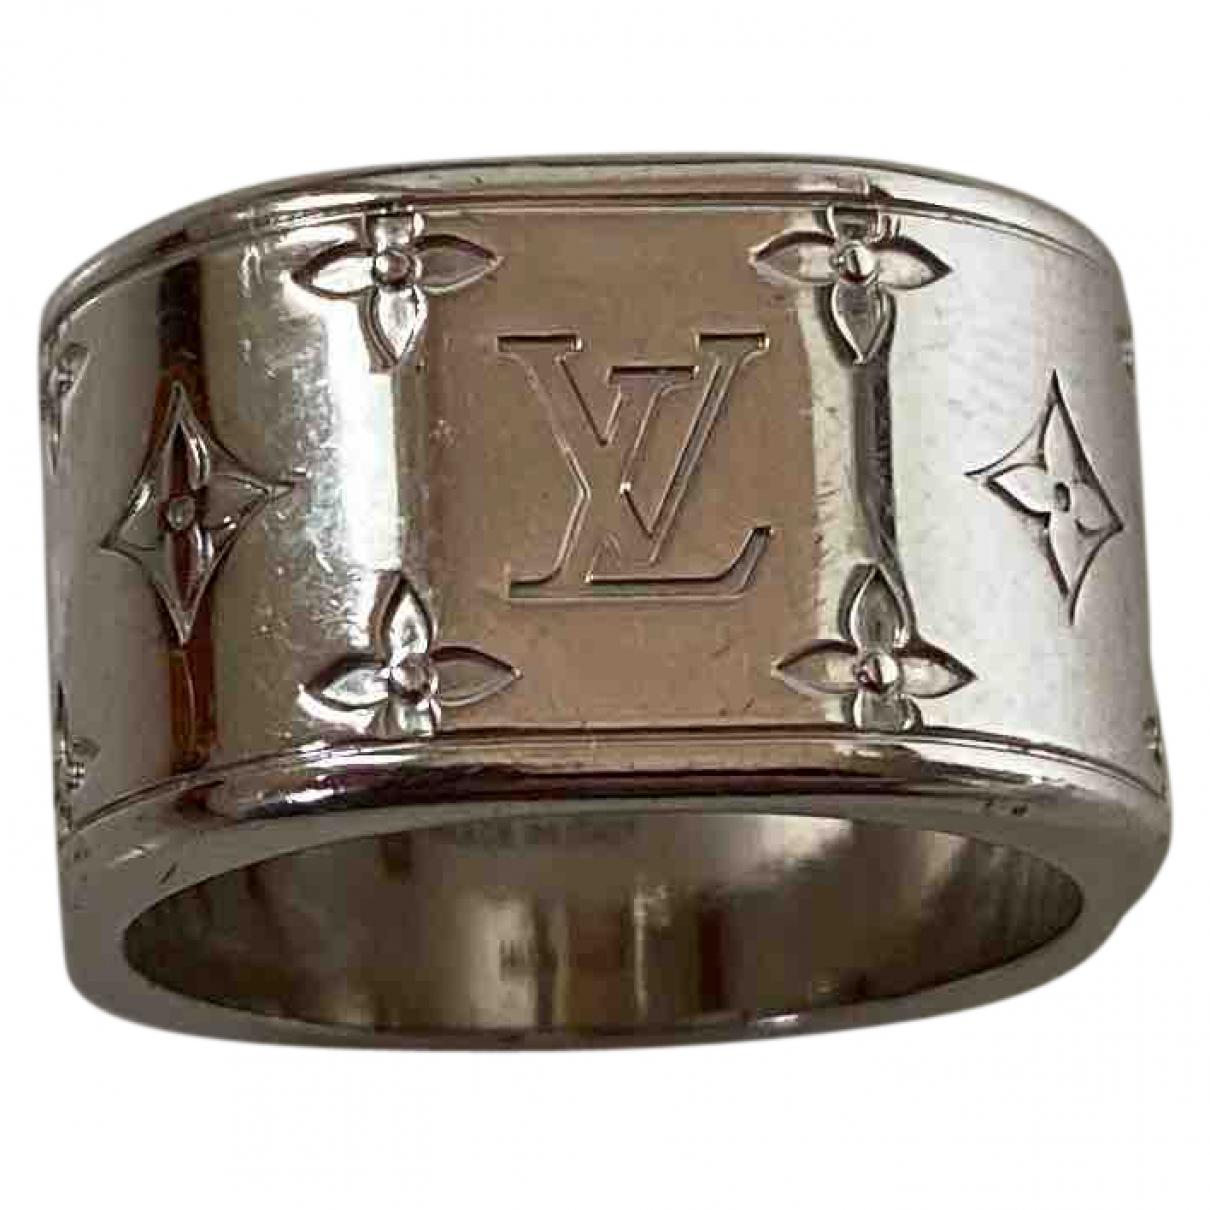 Louis Vuitton \N Schmuckstuecke in Metall